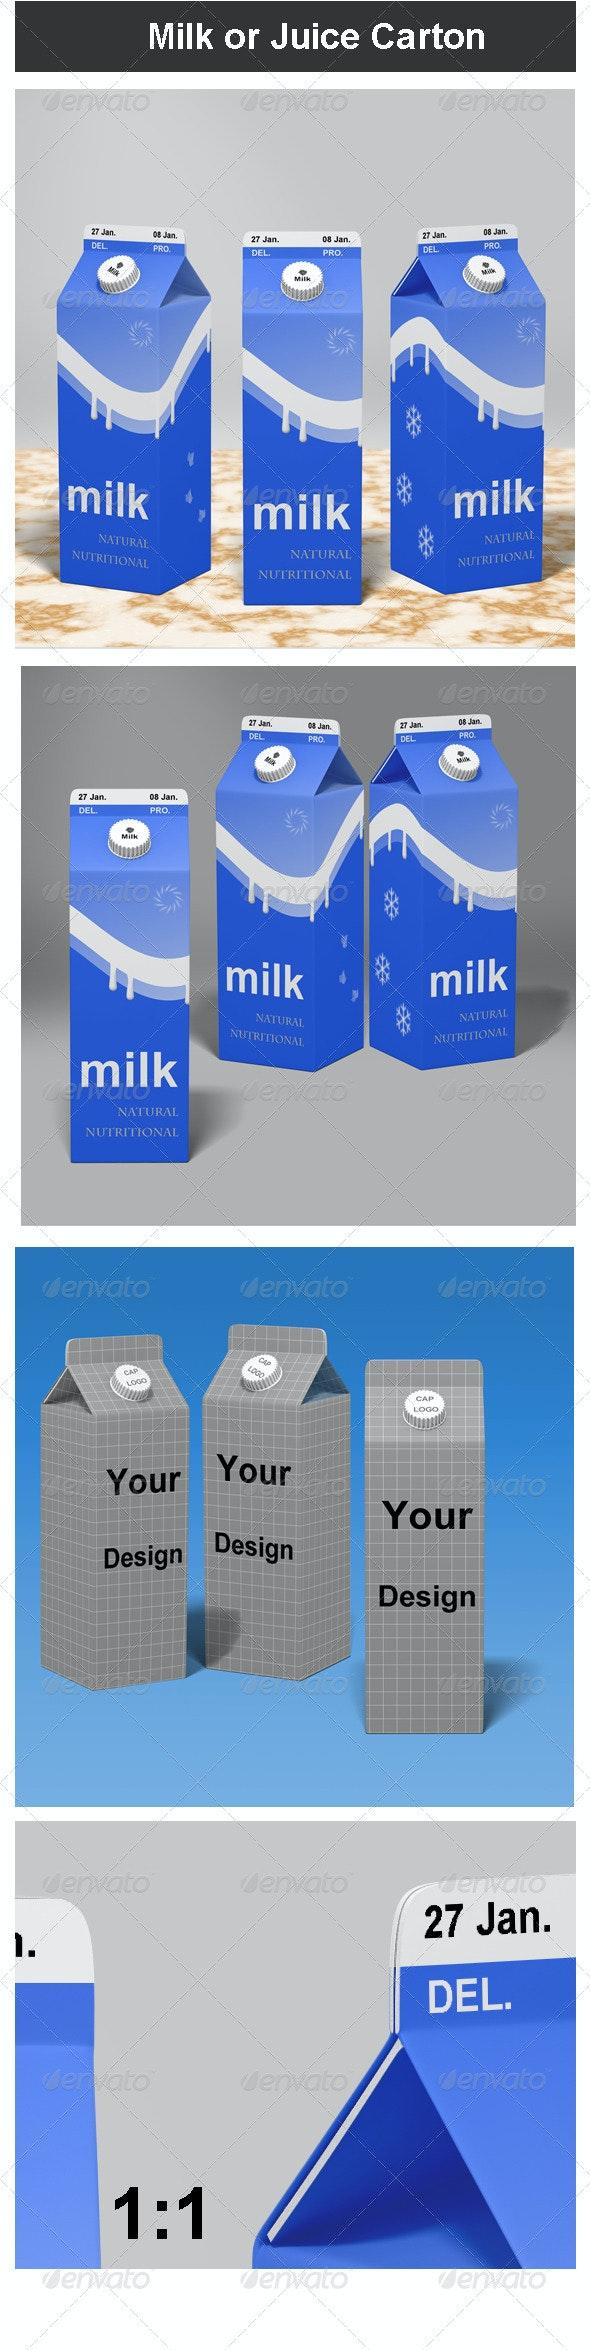 Milk or Juice Carton Mock-up - Food and Drink Packaging